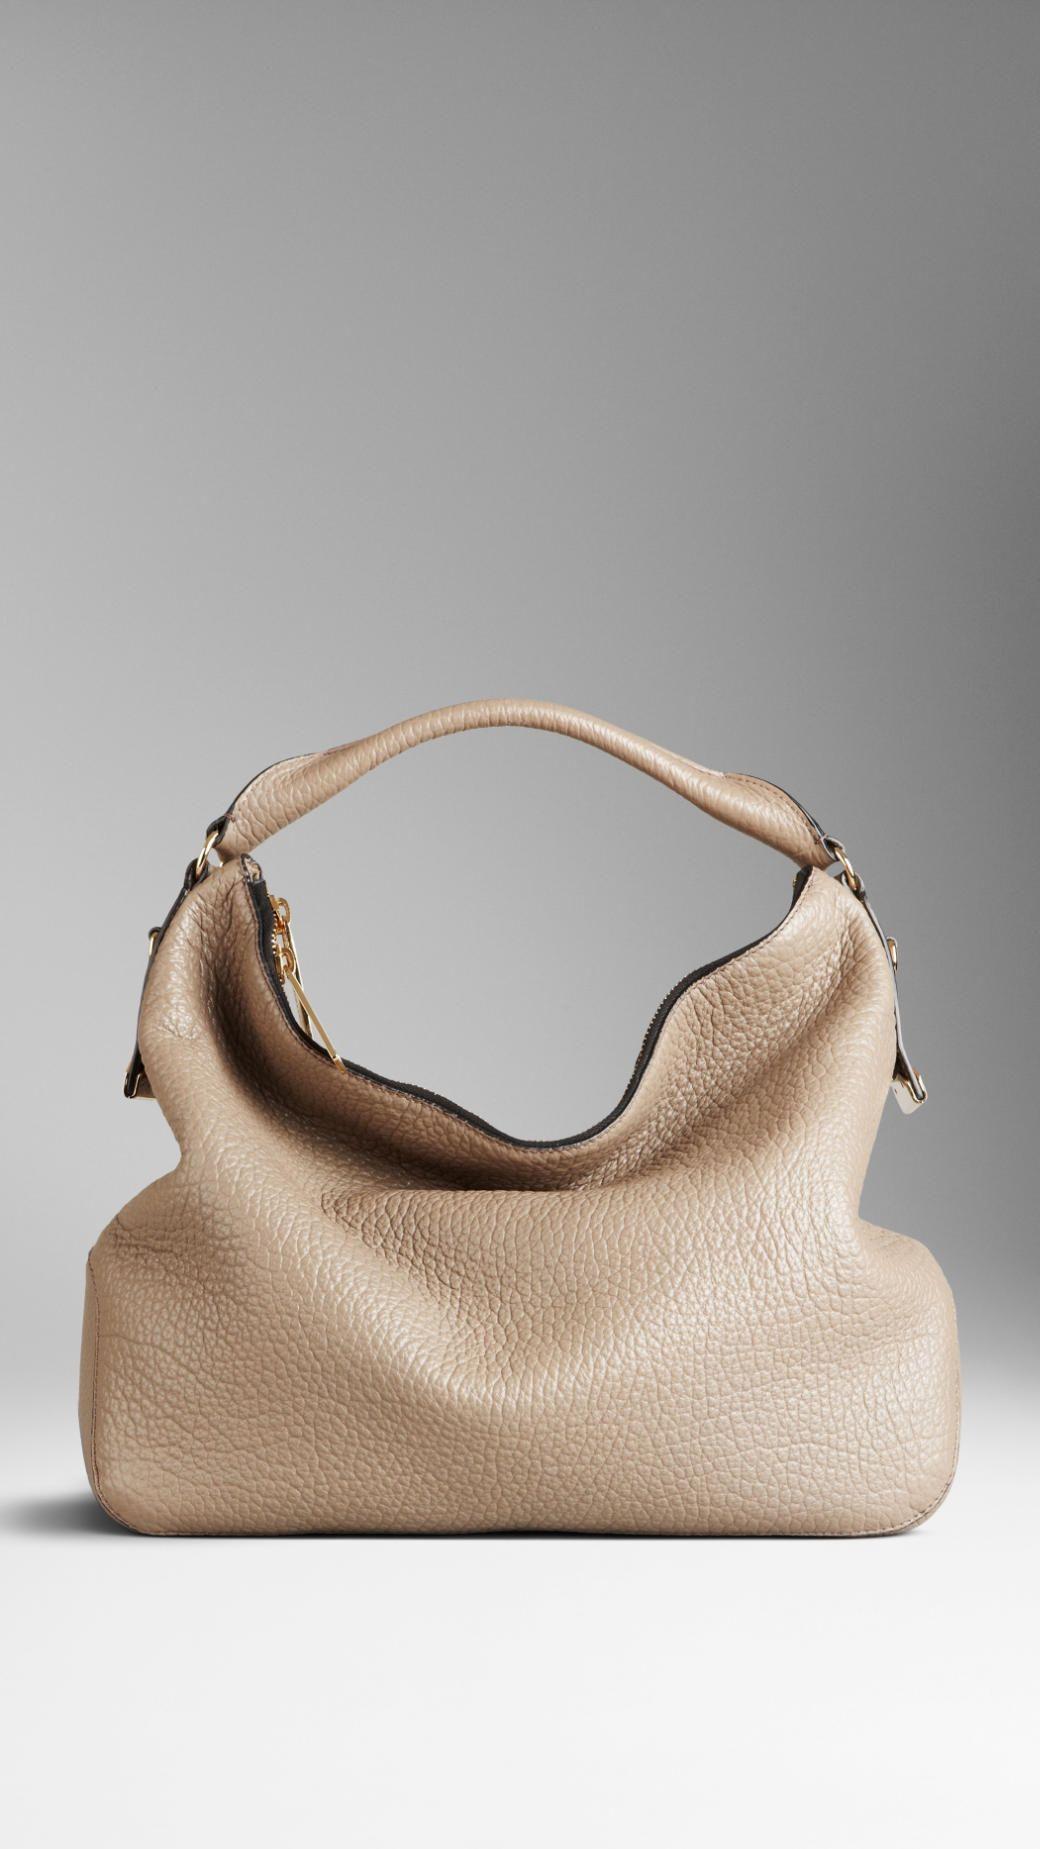 Burberry Medium Heritage Grain Leather Hobo Bag Hobo Bag Leather Hobo Bags Burberry Bag